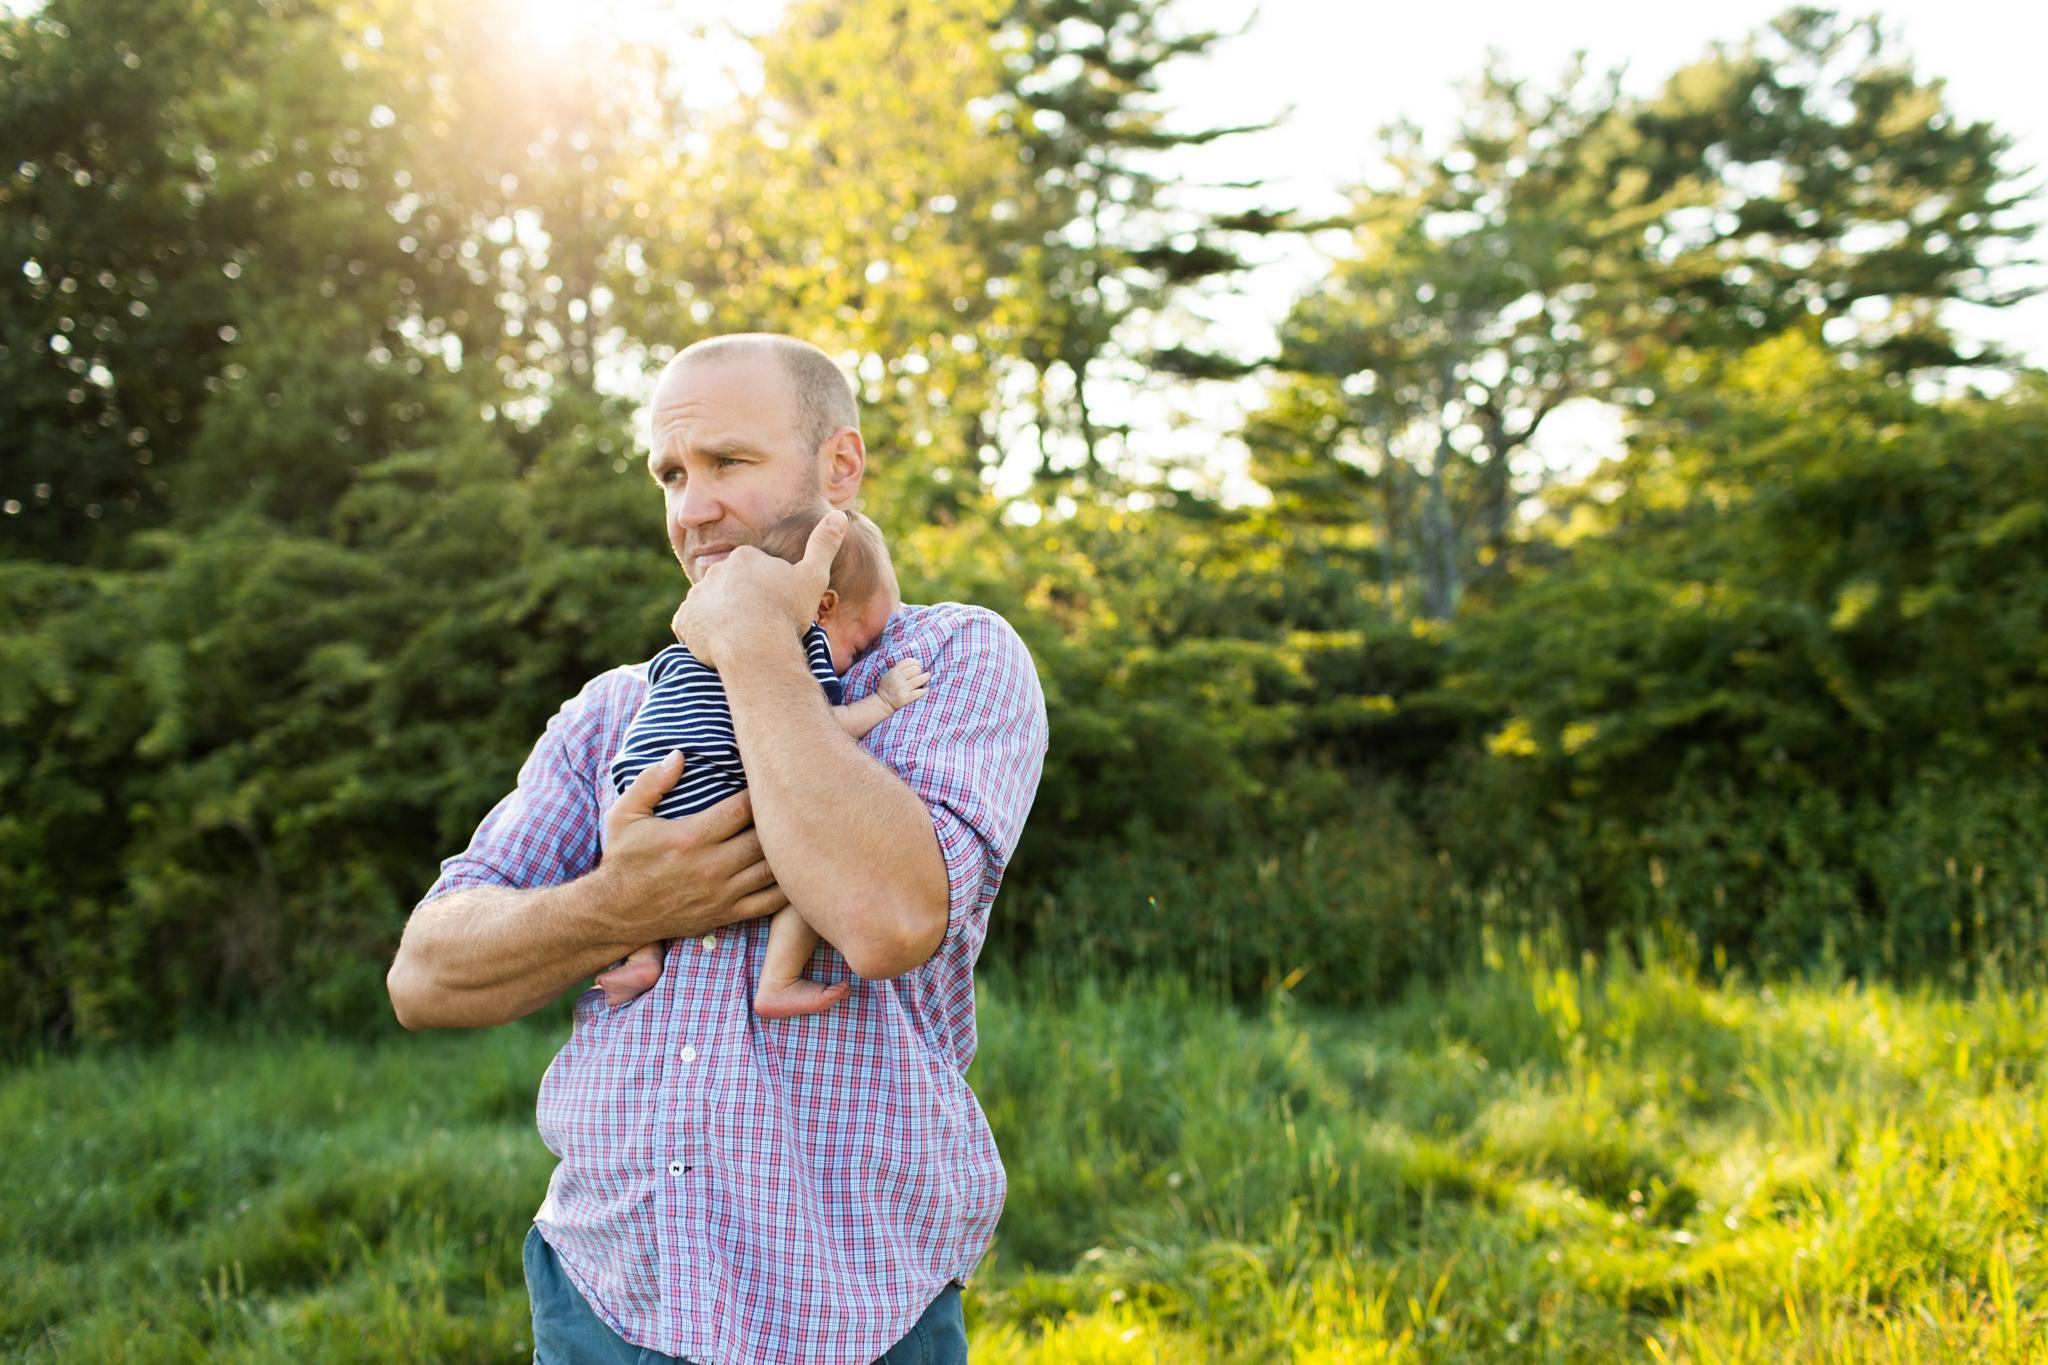 maine-newborn-photographer-stepheneycollins-55.jpg